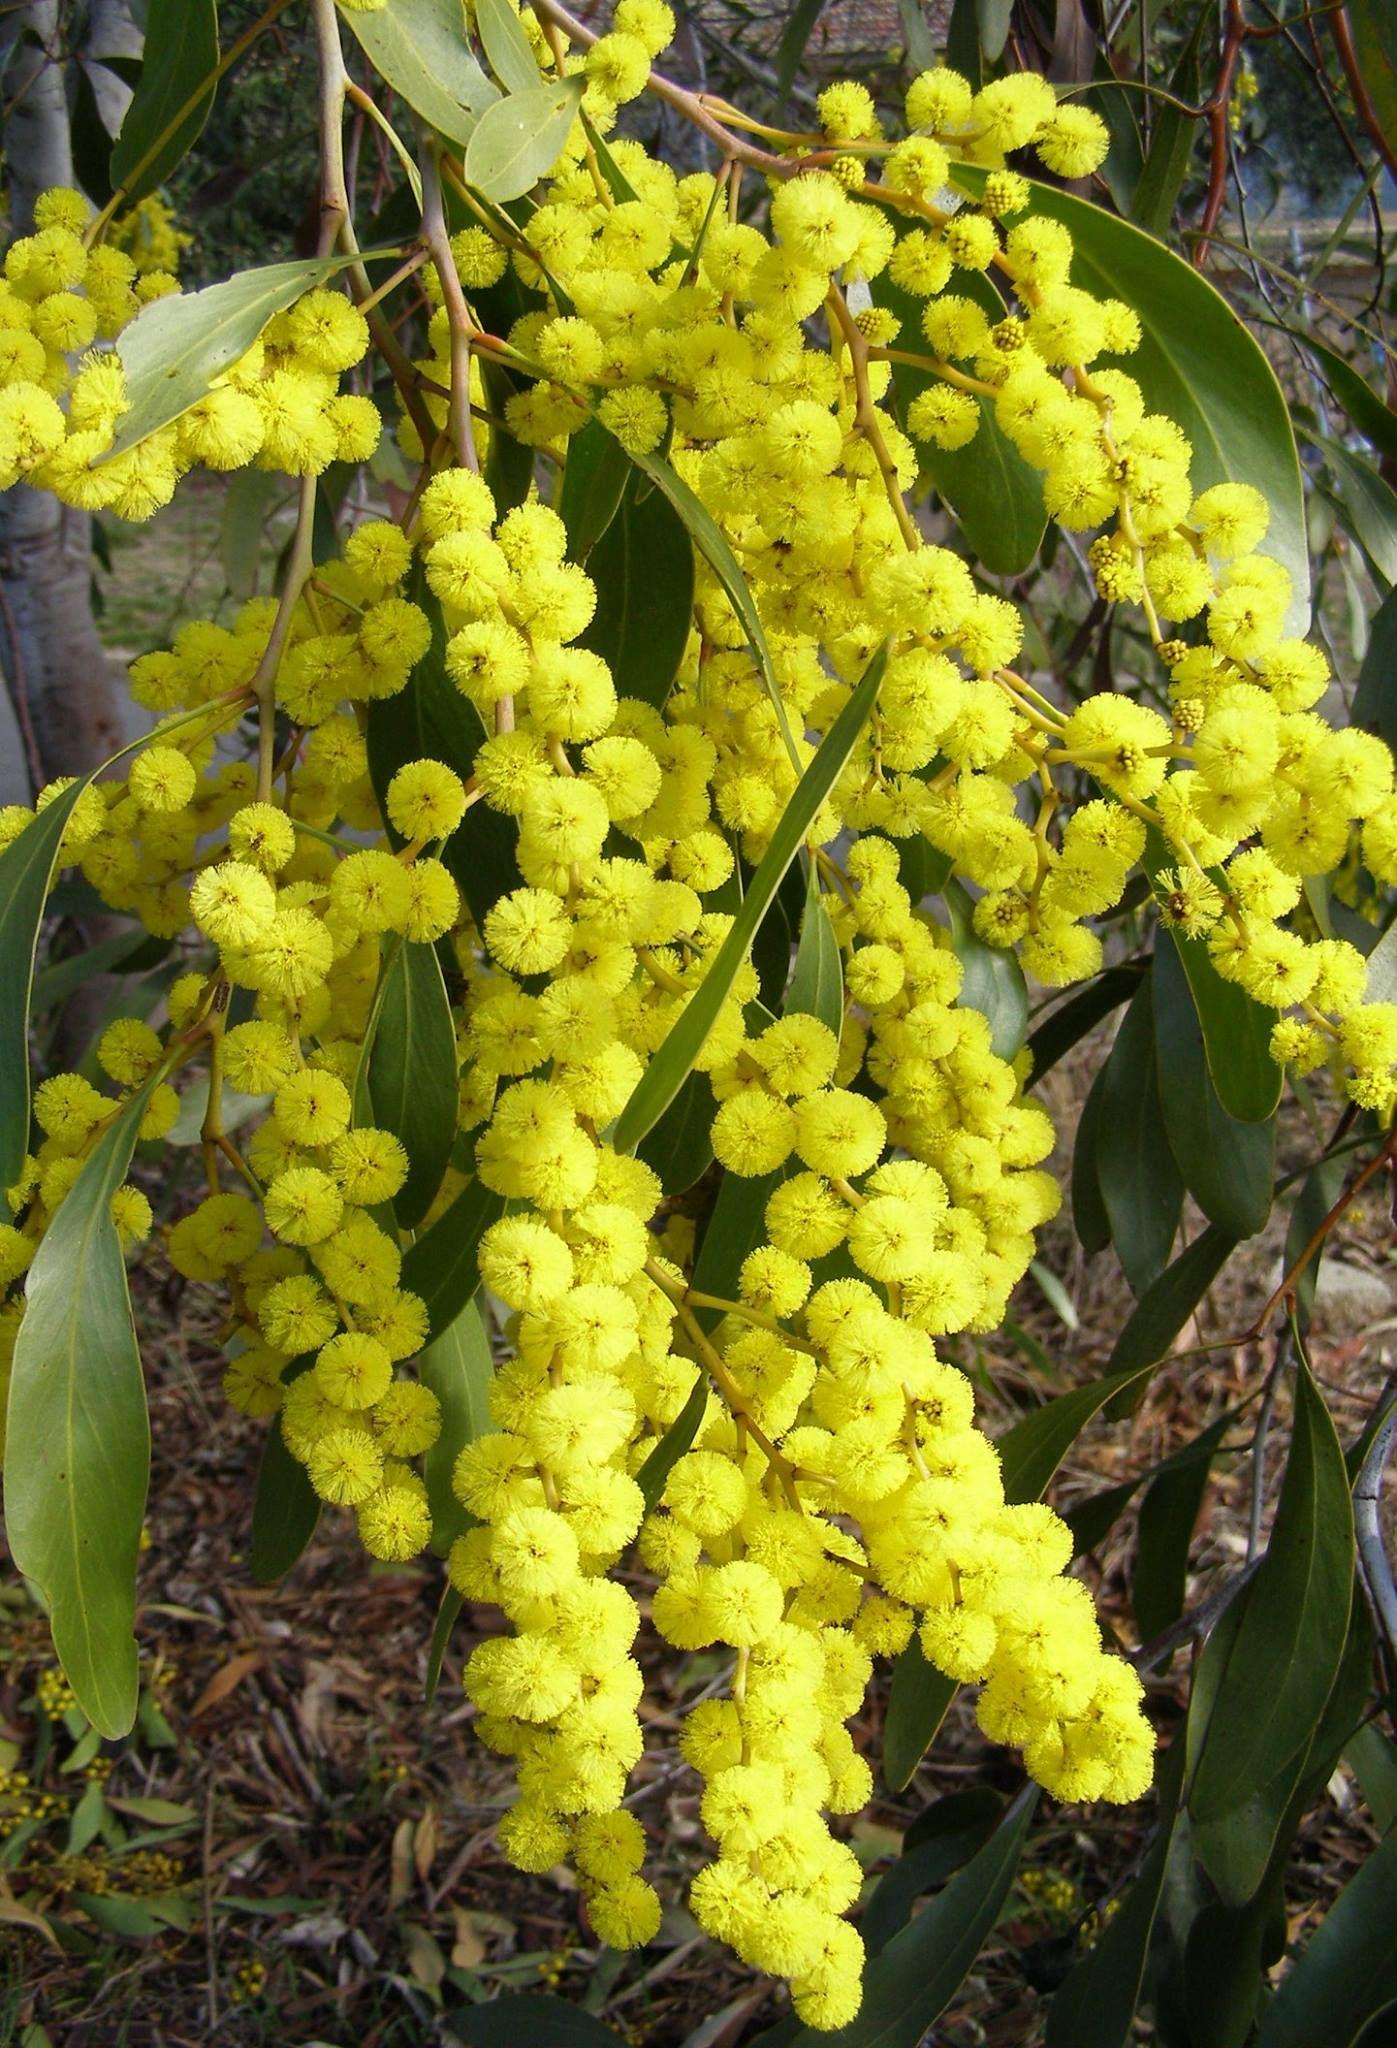 Golden Wattle Australia S National Flower Australian Native Garden Flowers Australia Australian Plants